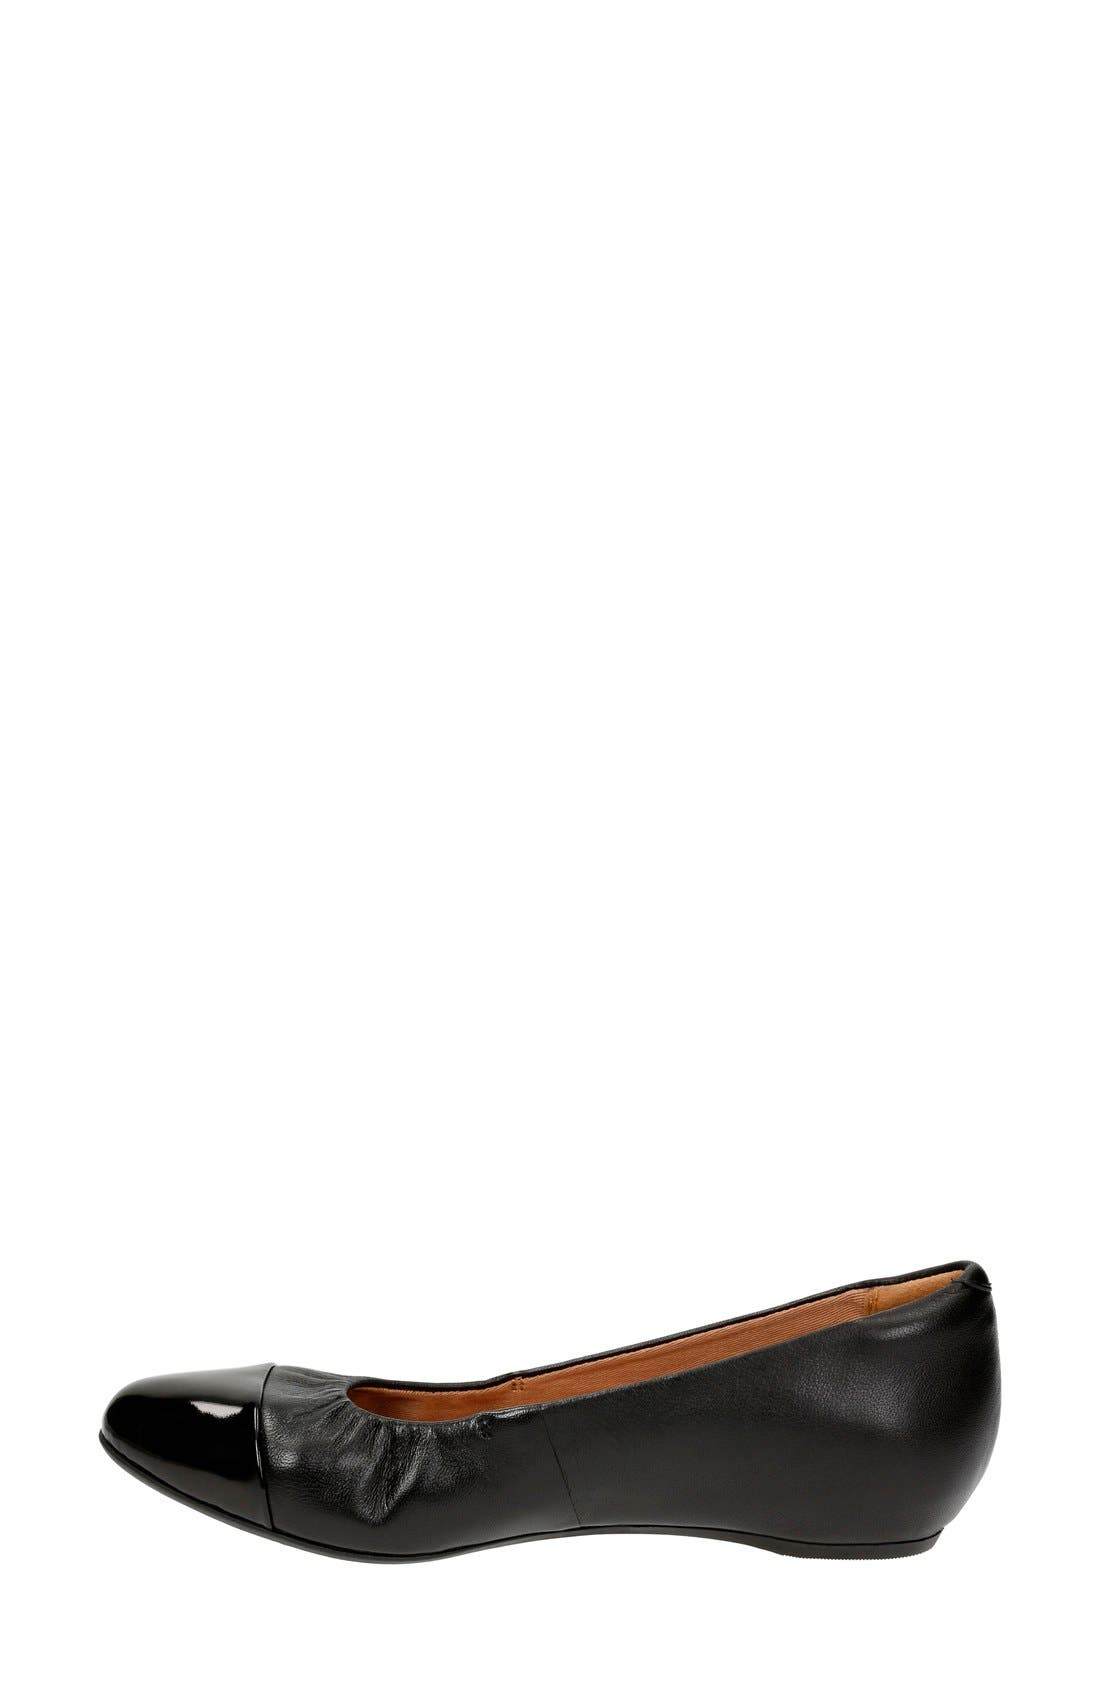 Alternate Image 2  - Clarks® 'Alitay Susan' Cap Toe Flat (Women)